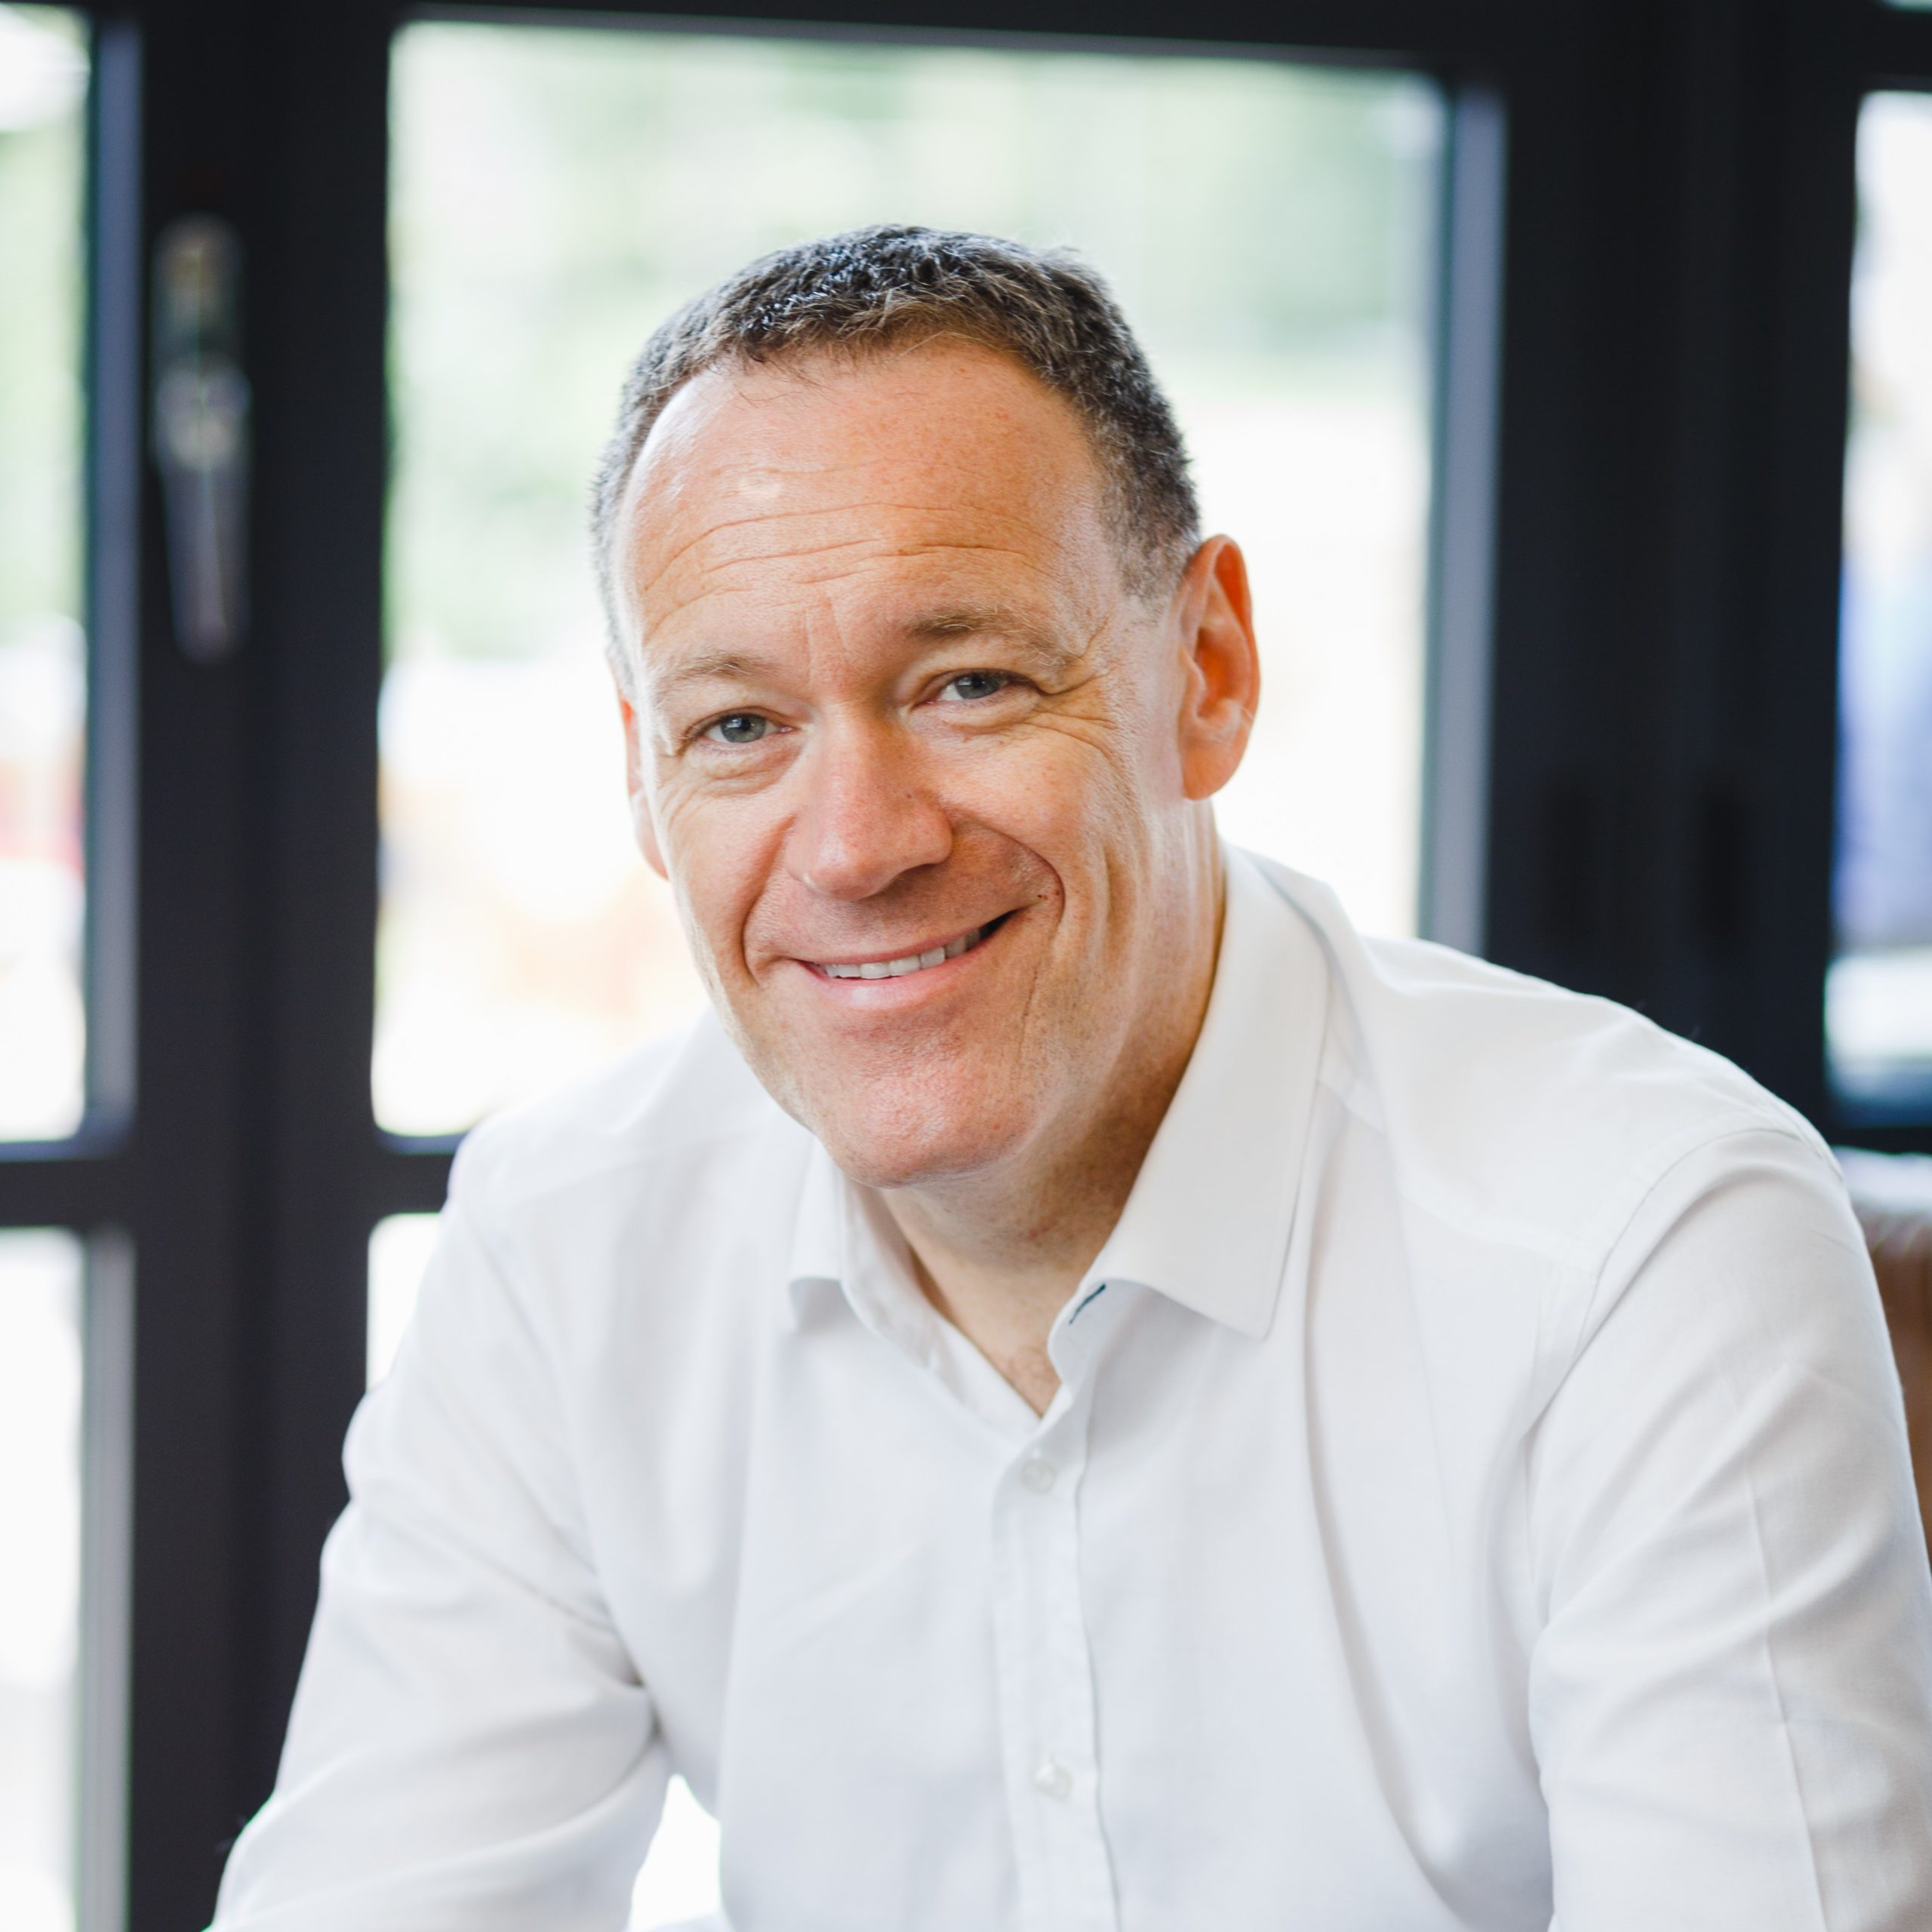 David Eldridge, Chairman